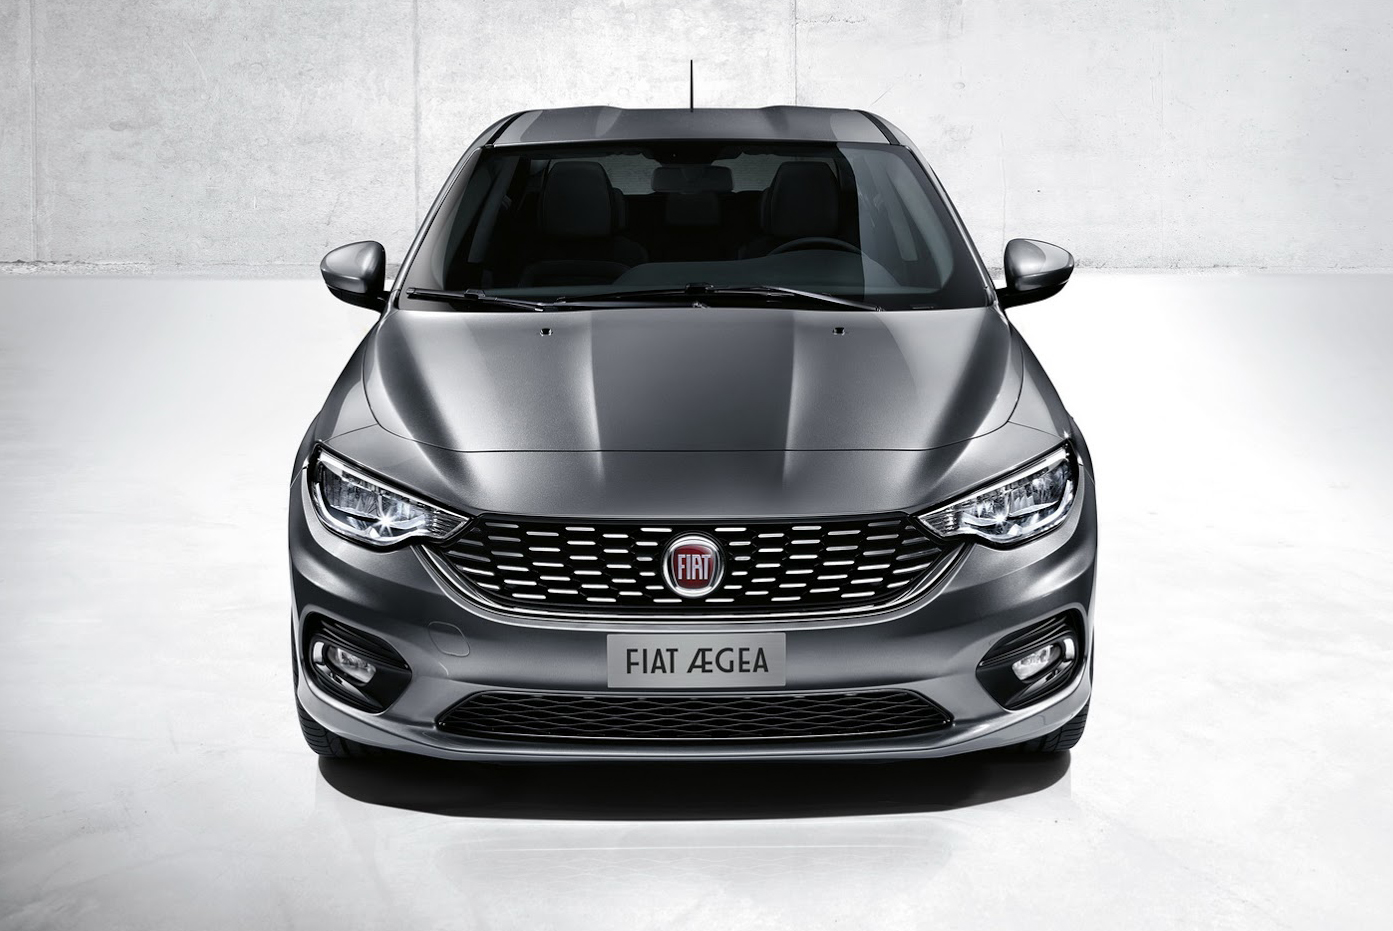 New Fiat Small Sedan Revealed, BMW 1 Series Sedan Rendered